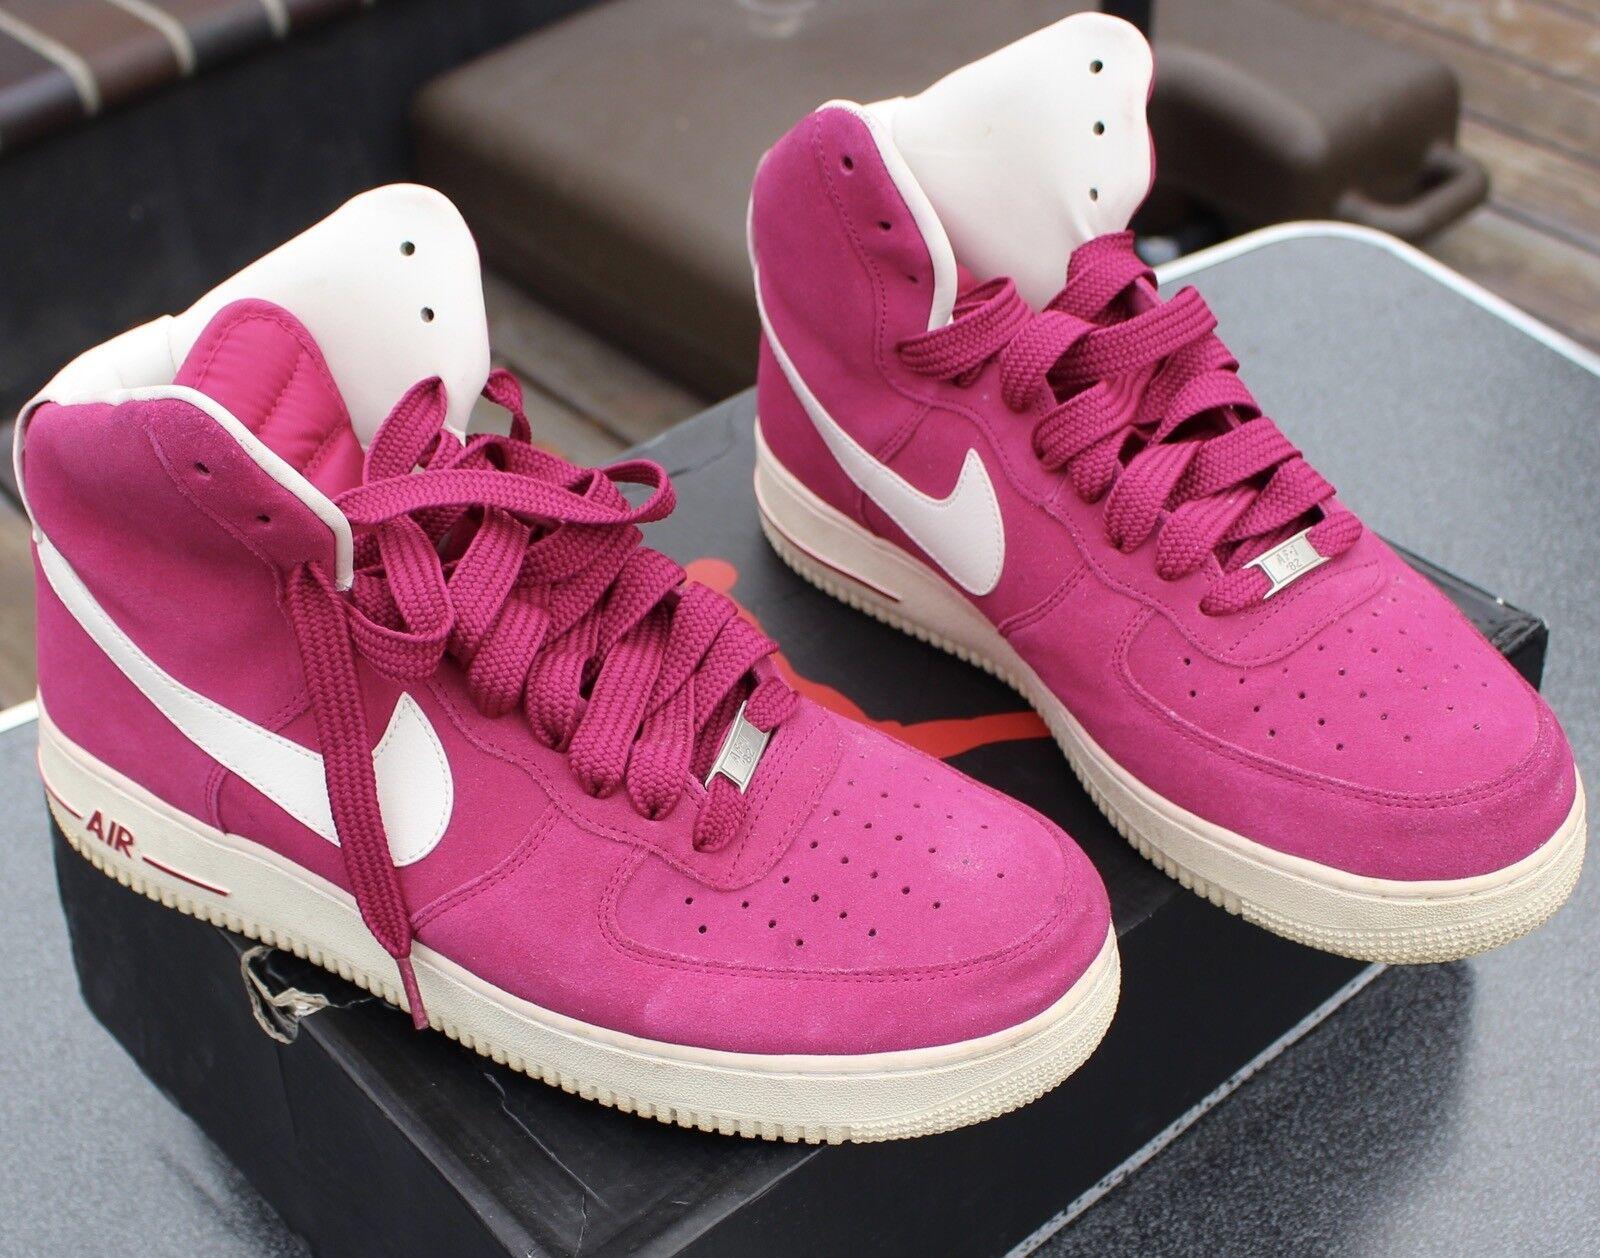 sports shoes 2b899 adc78 Rare Nike Air Force 1 fucsia High 07 Blazer Pack zapatos 315121-602 rosa  fucsia 1 cómodo confortable y atractivo d5665e